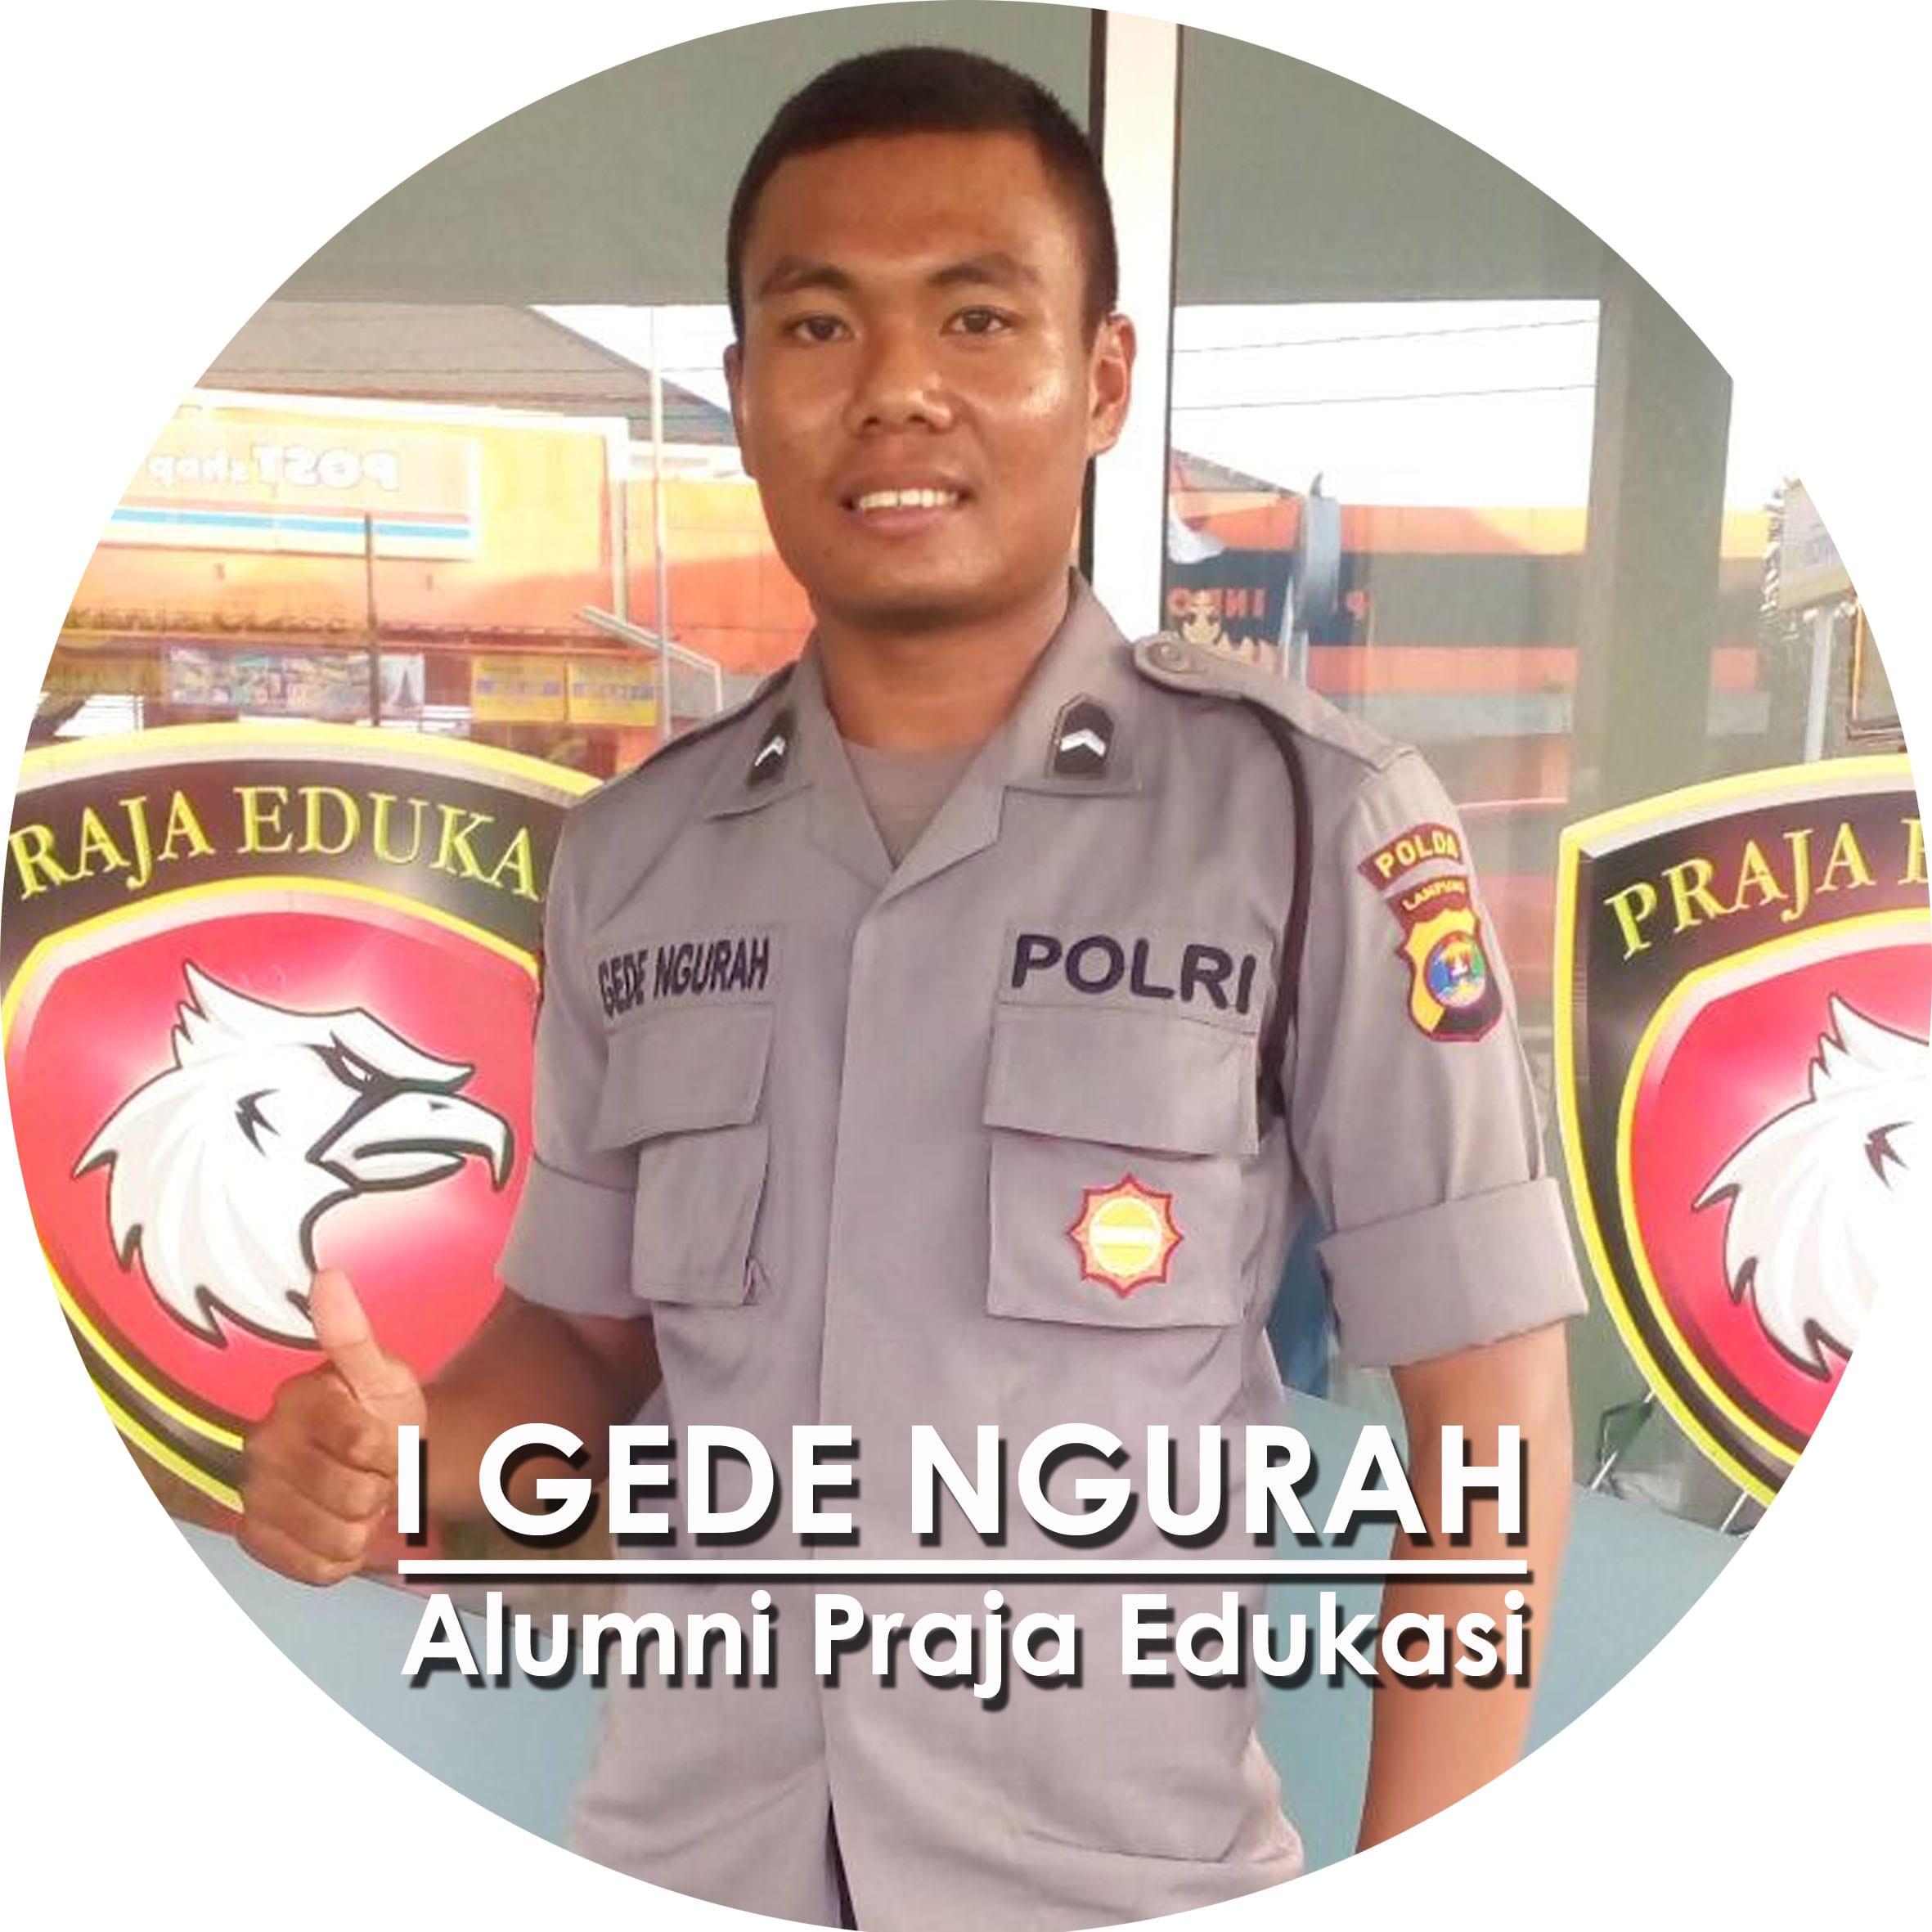 I Gede Ngurah Sumiawan